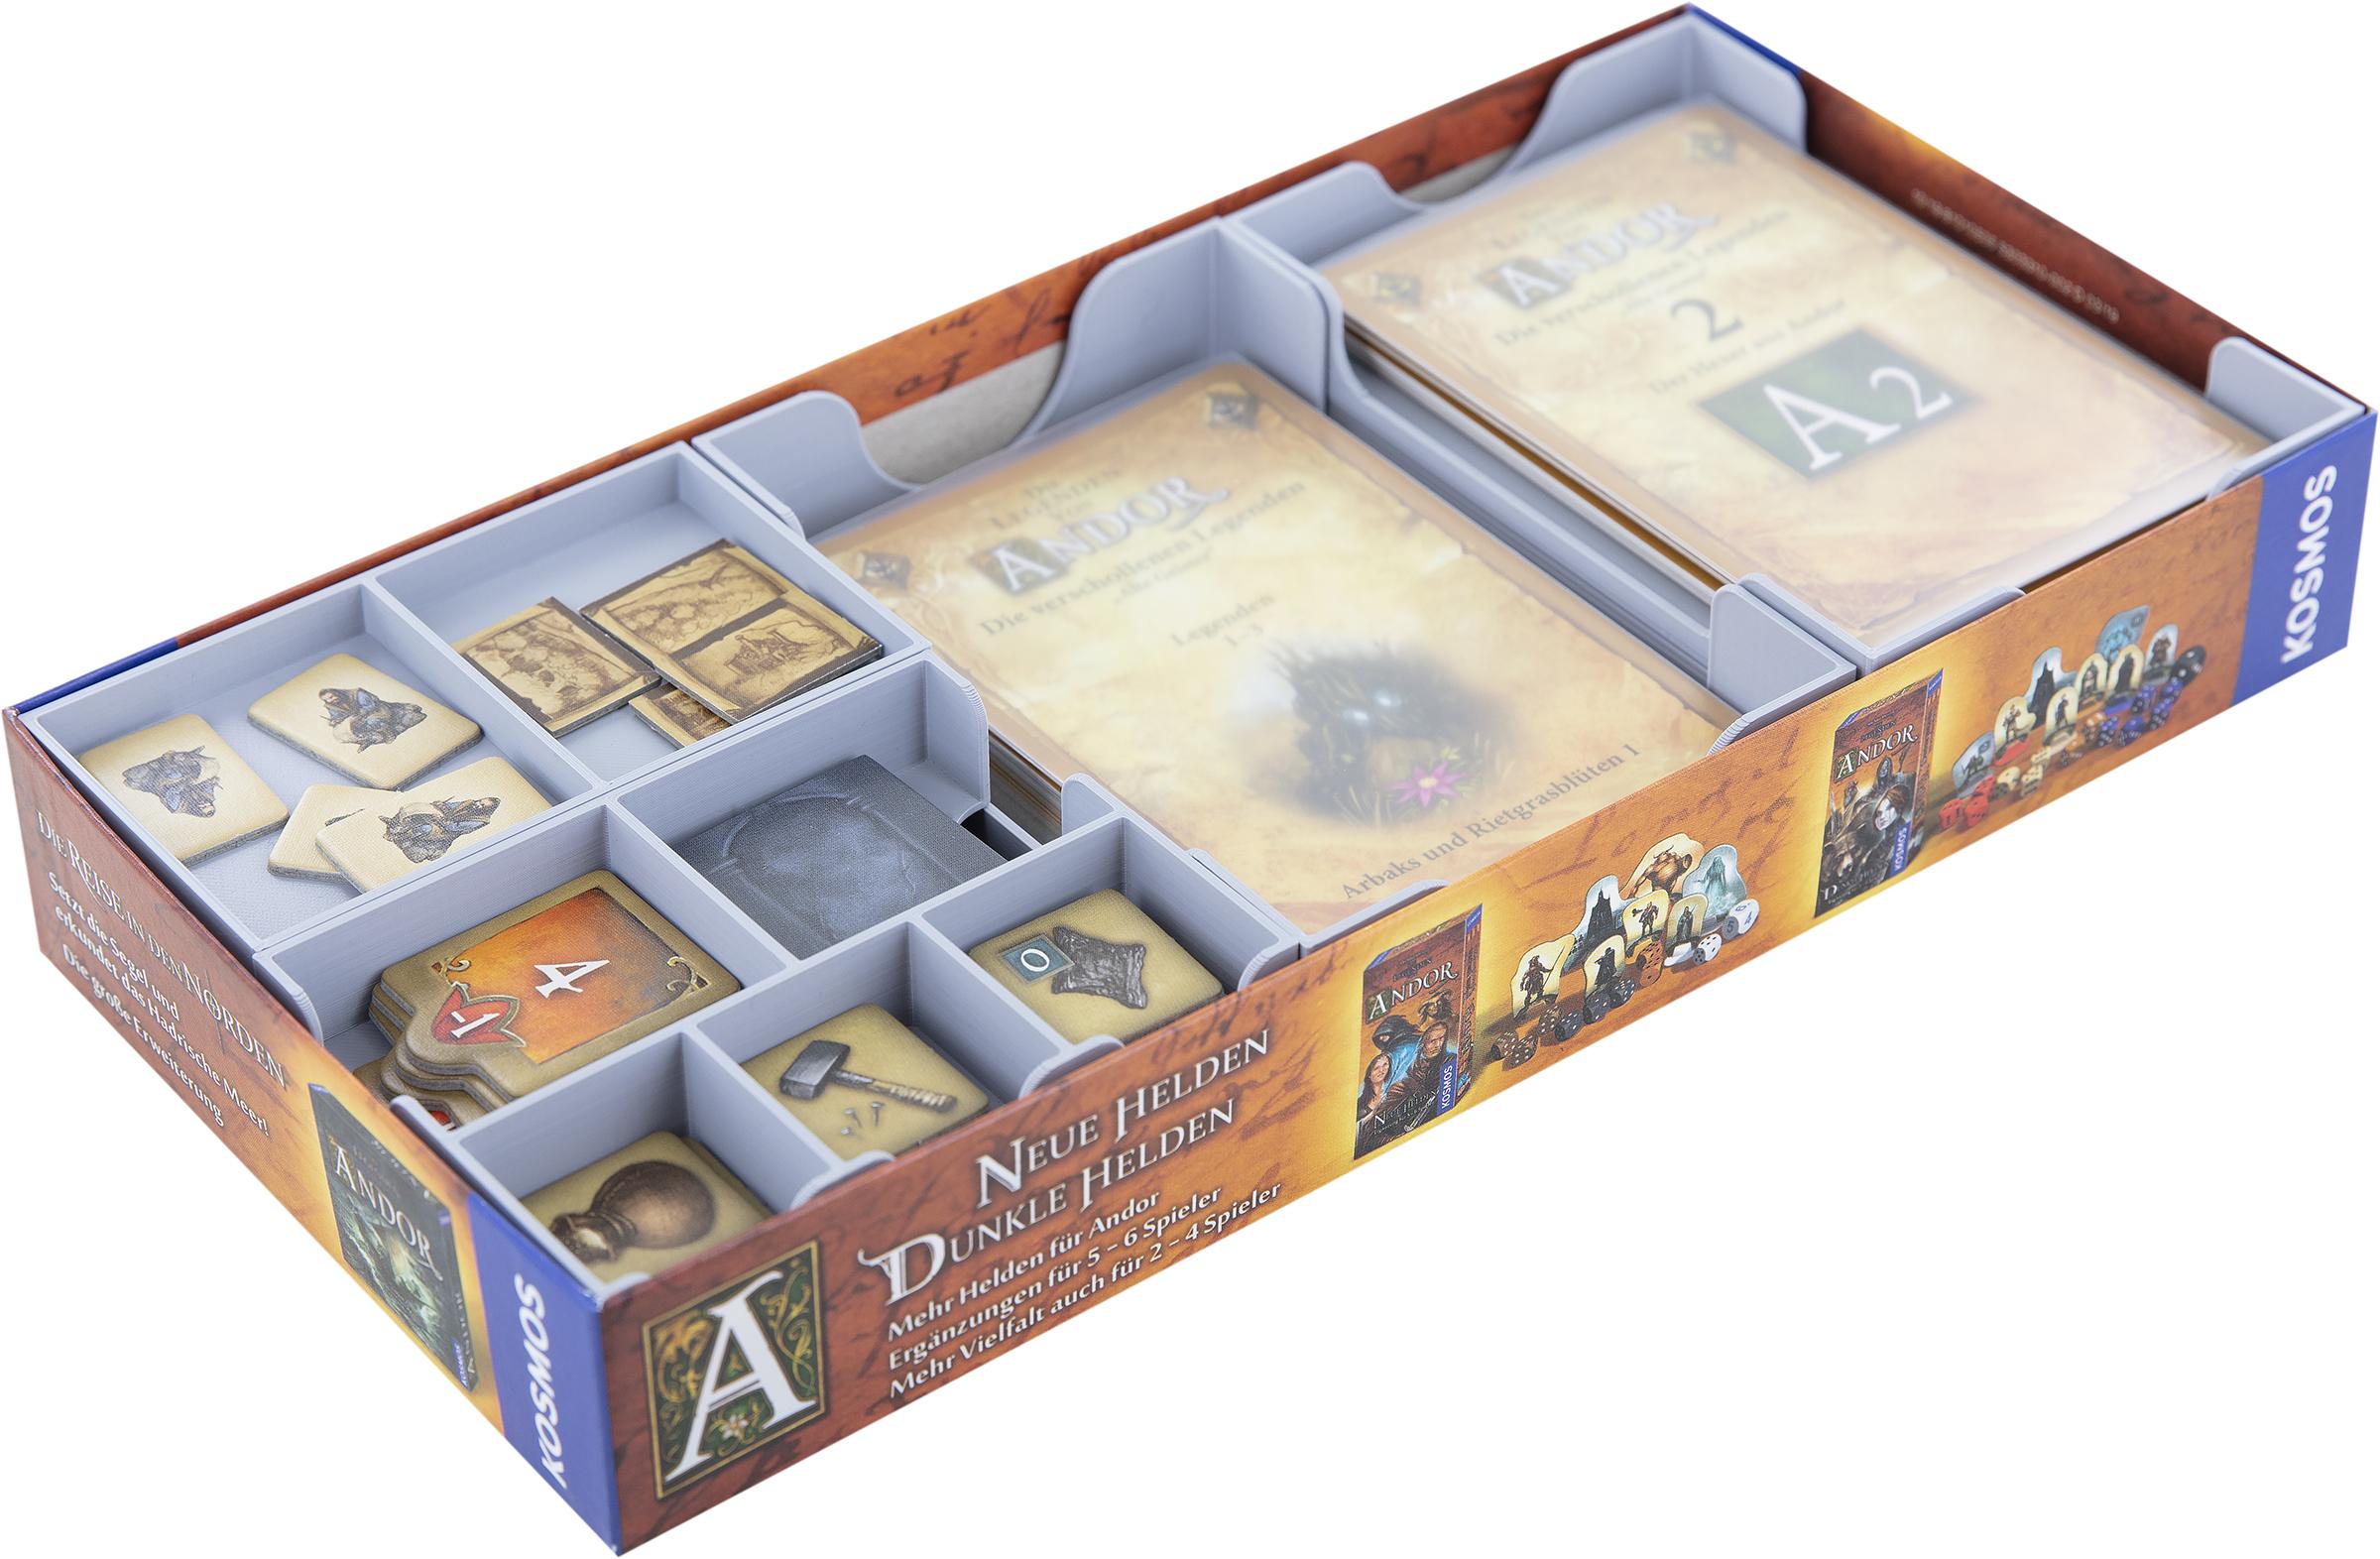 Feldherr Organizer for The Legends of Andor: Lost Legends - Ancient Spirits